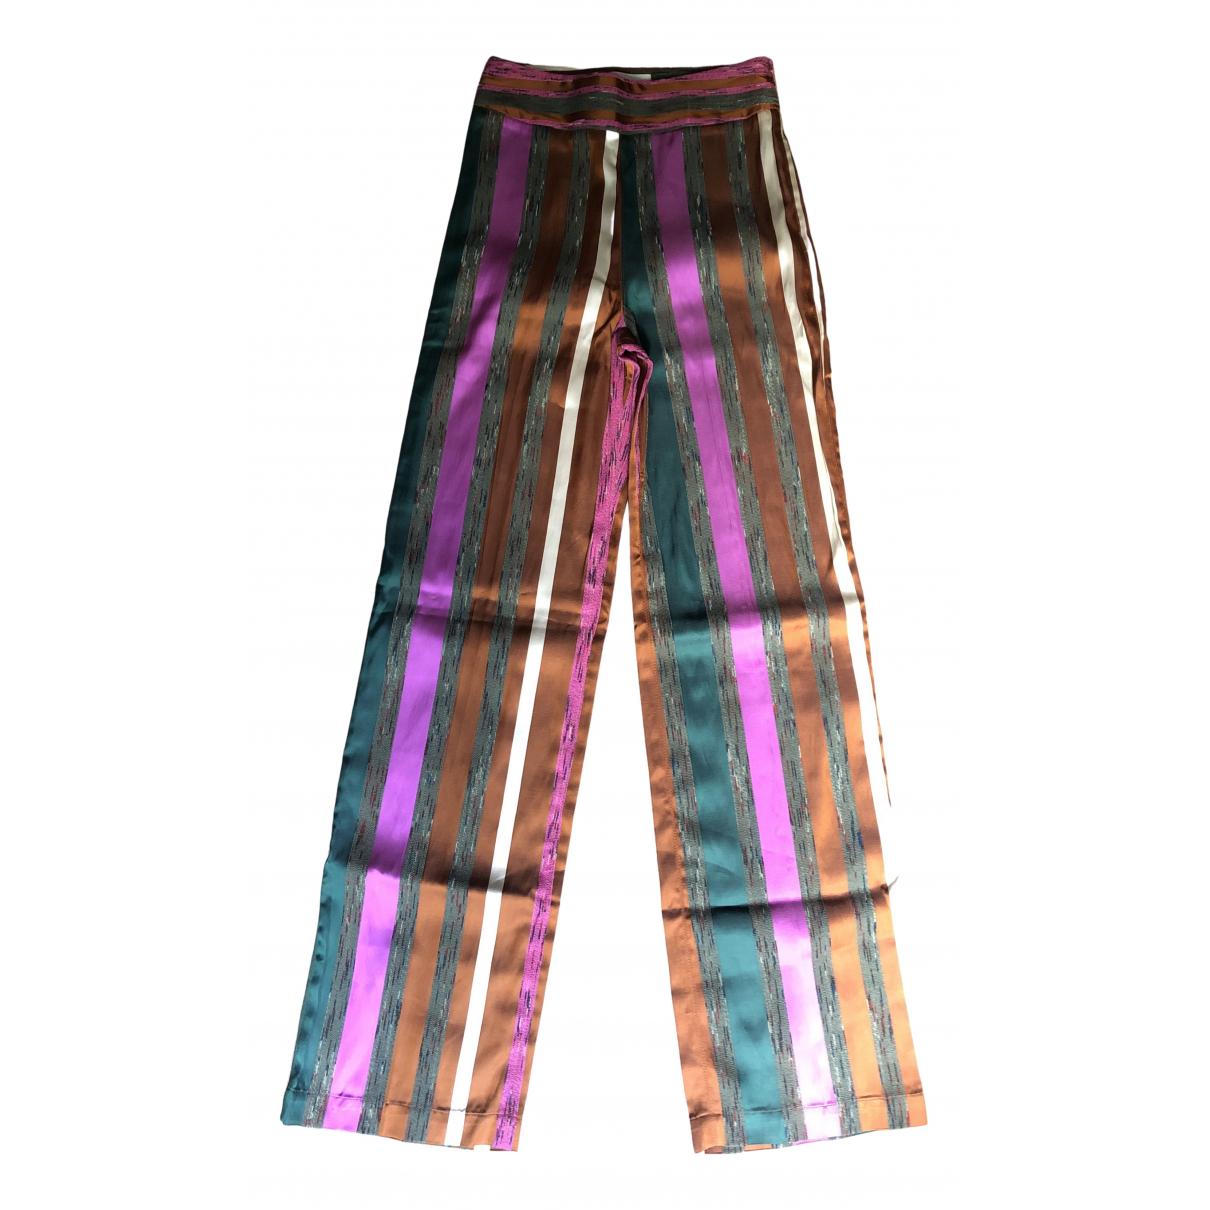 Sézane Spring Summer 2020 Multicolour Cotton Trousers for Women 34 FR